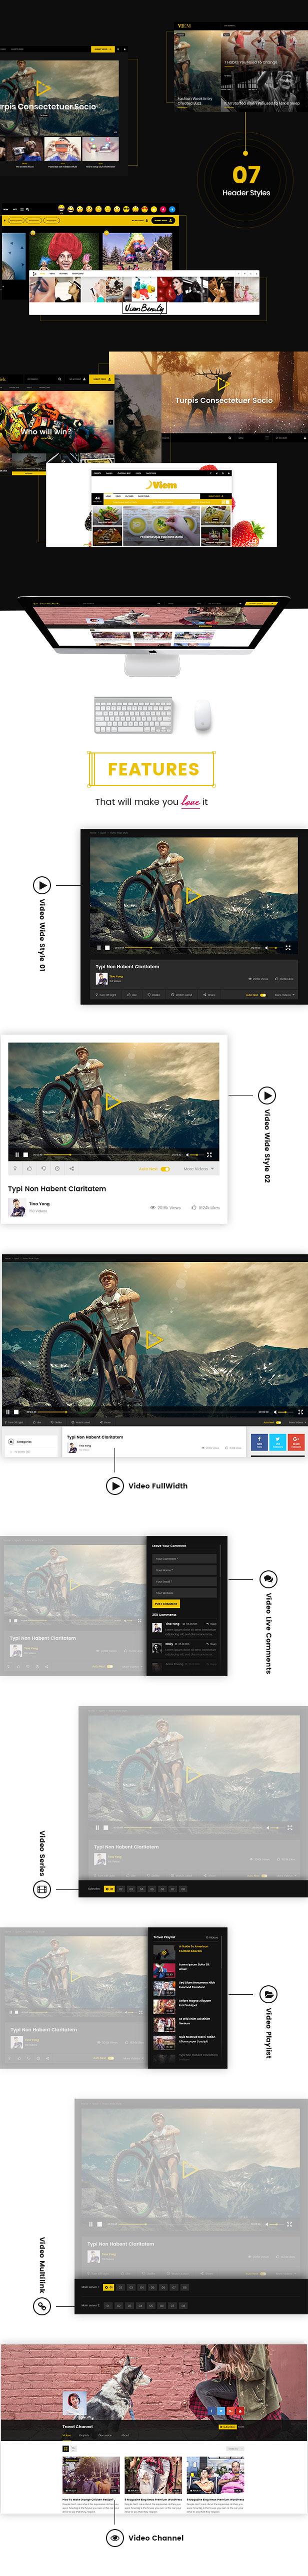 Viem - Video WordPress Theme - 2